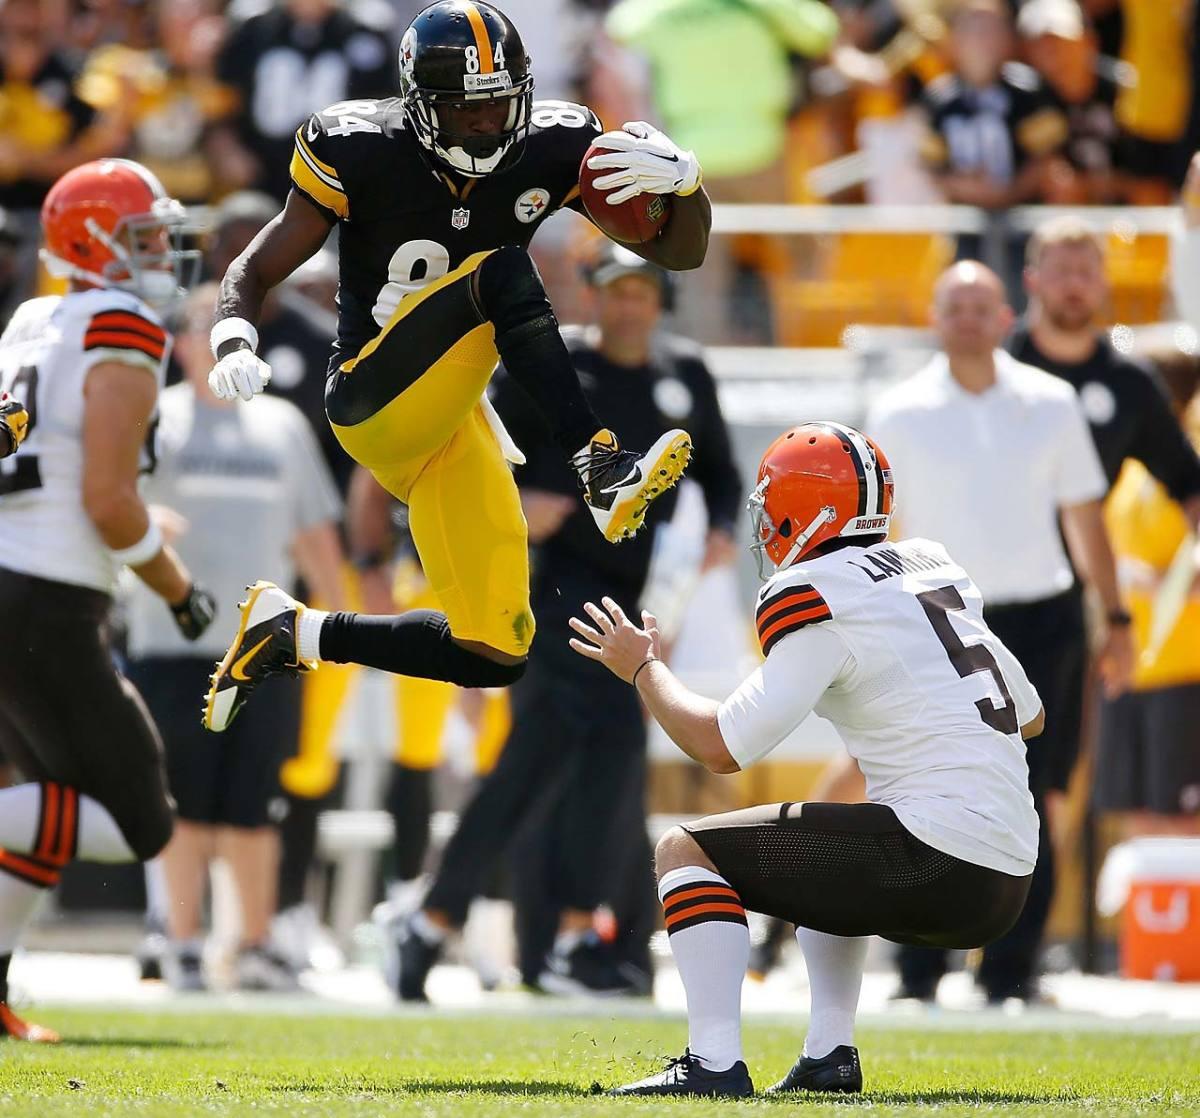 Antonio-Brown-kick-4.jpg